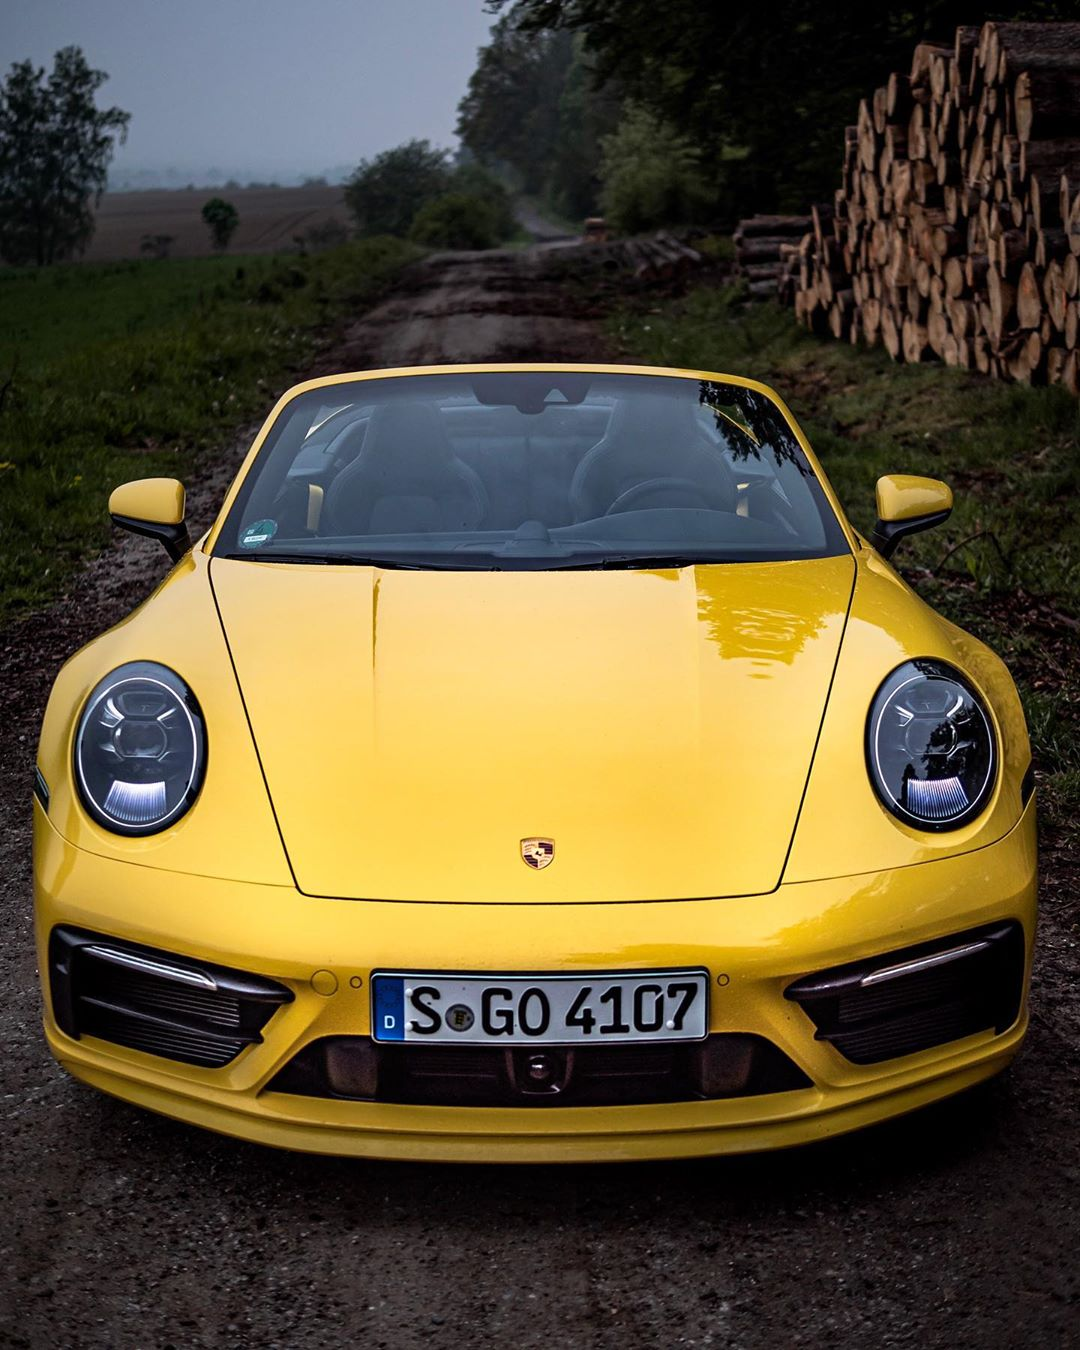 C O Z Y  992  M O M E N T S👌…weather isn't great at all but the 992 sure looks stunning with this optional Sport Design Pack🤙 @porsche_newsroom #porsche #porsche911 #porsche992 #porsche992cabriolet #911 #992 #carrera #automanntv